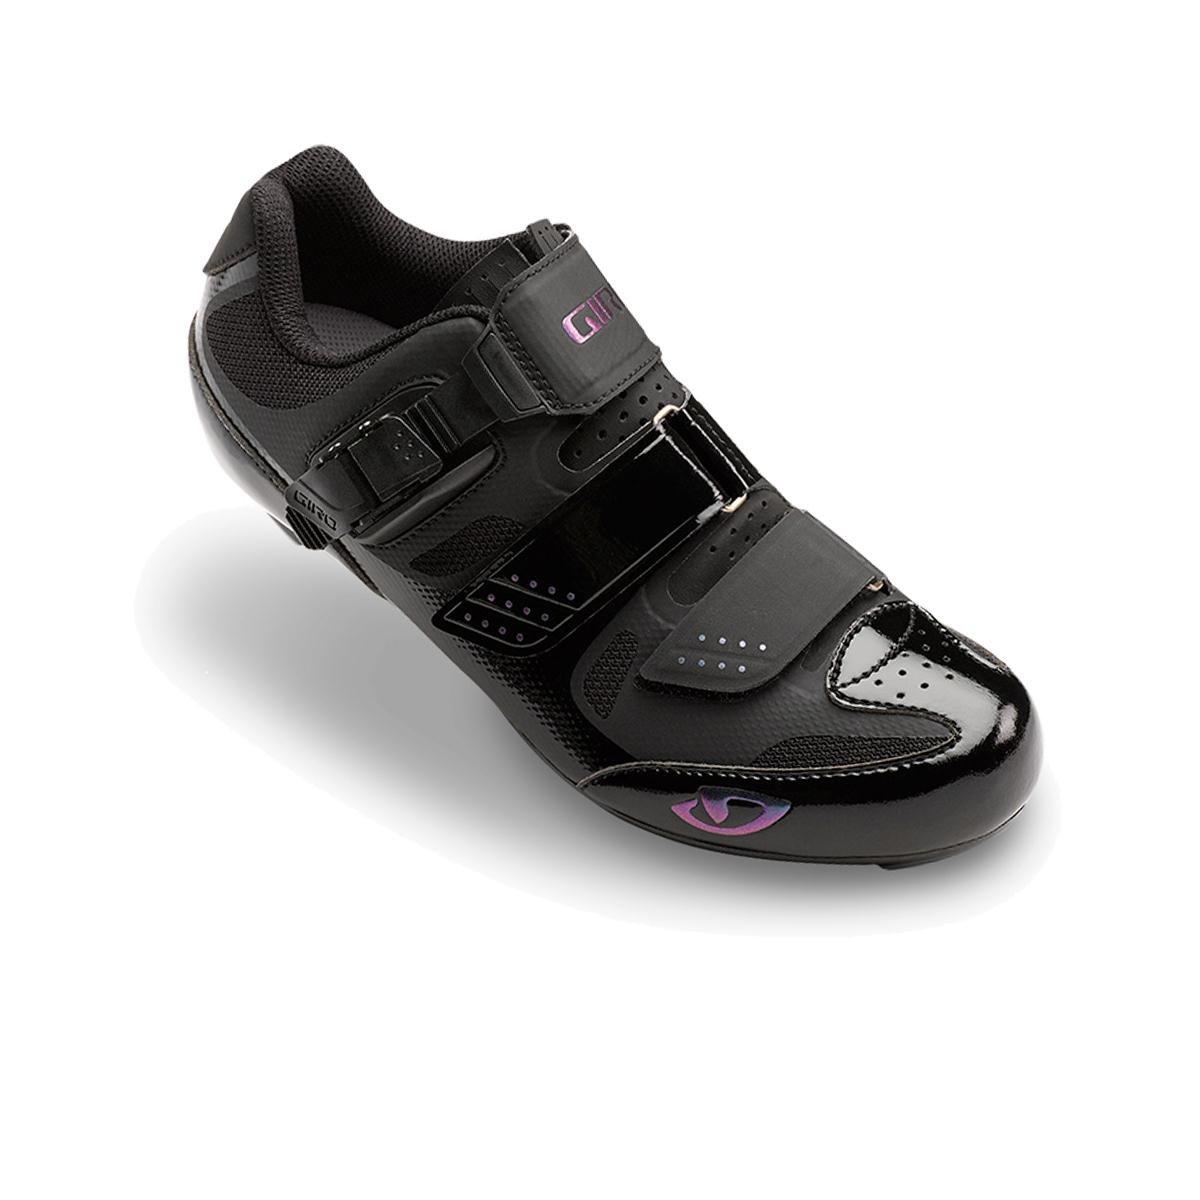 Giro Solara II Womens Road Cycling Shoes B015T74DJC 39.5|Black